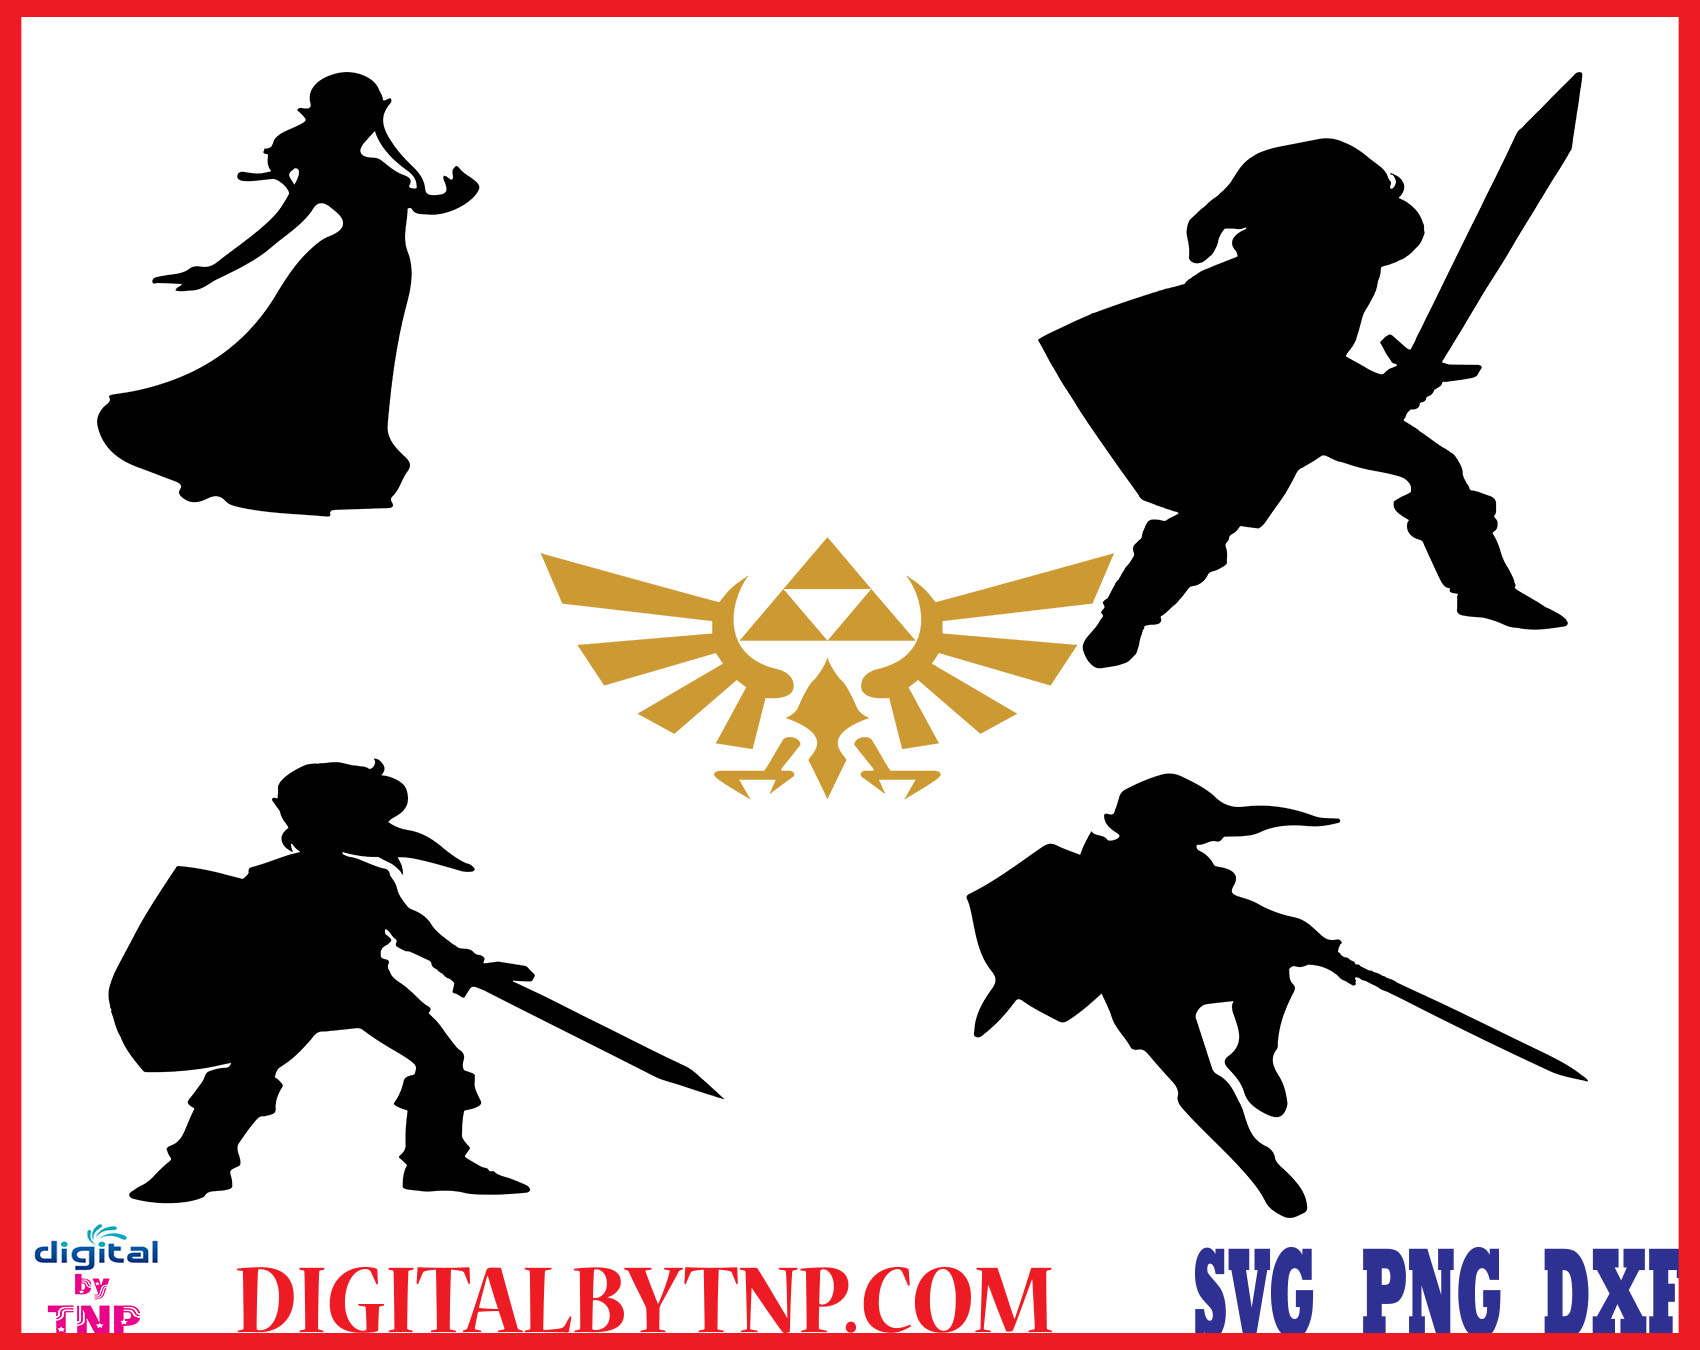 Zelda Svg The Legend Of Zelda Alphabet Clipart Zelda Characters Font Bundle Silhouette Stencil Cricut Vector Cut File Svg Png Pdf Eps Dxf Customer Satisfaction Is Our Priority